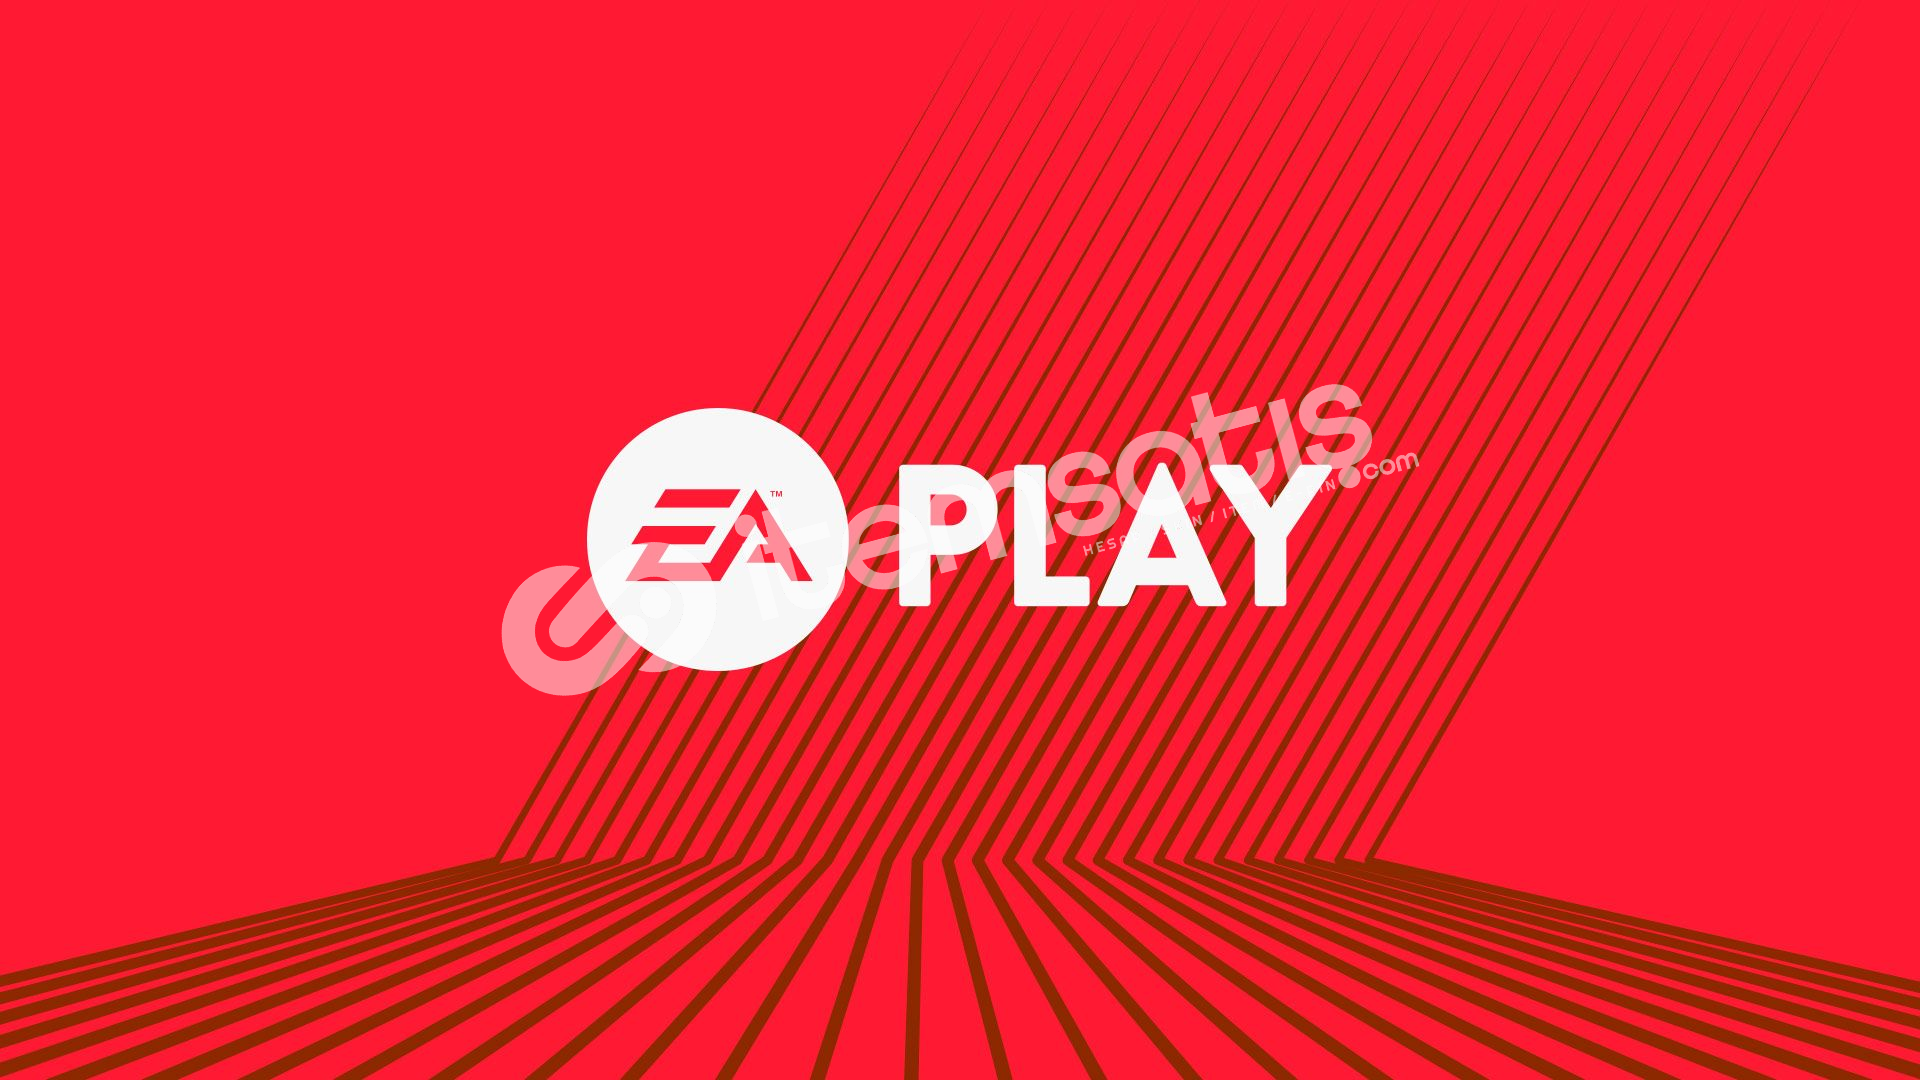 Sınırsız EA Play (8.49TL) Son 2 Stok